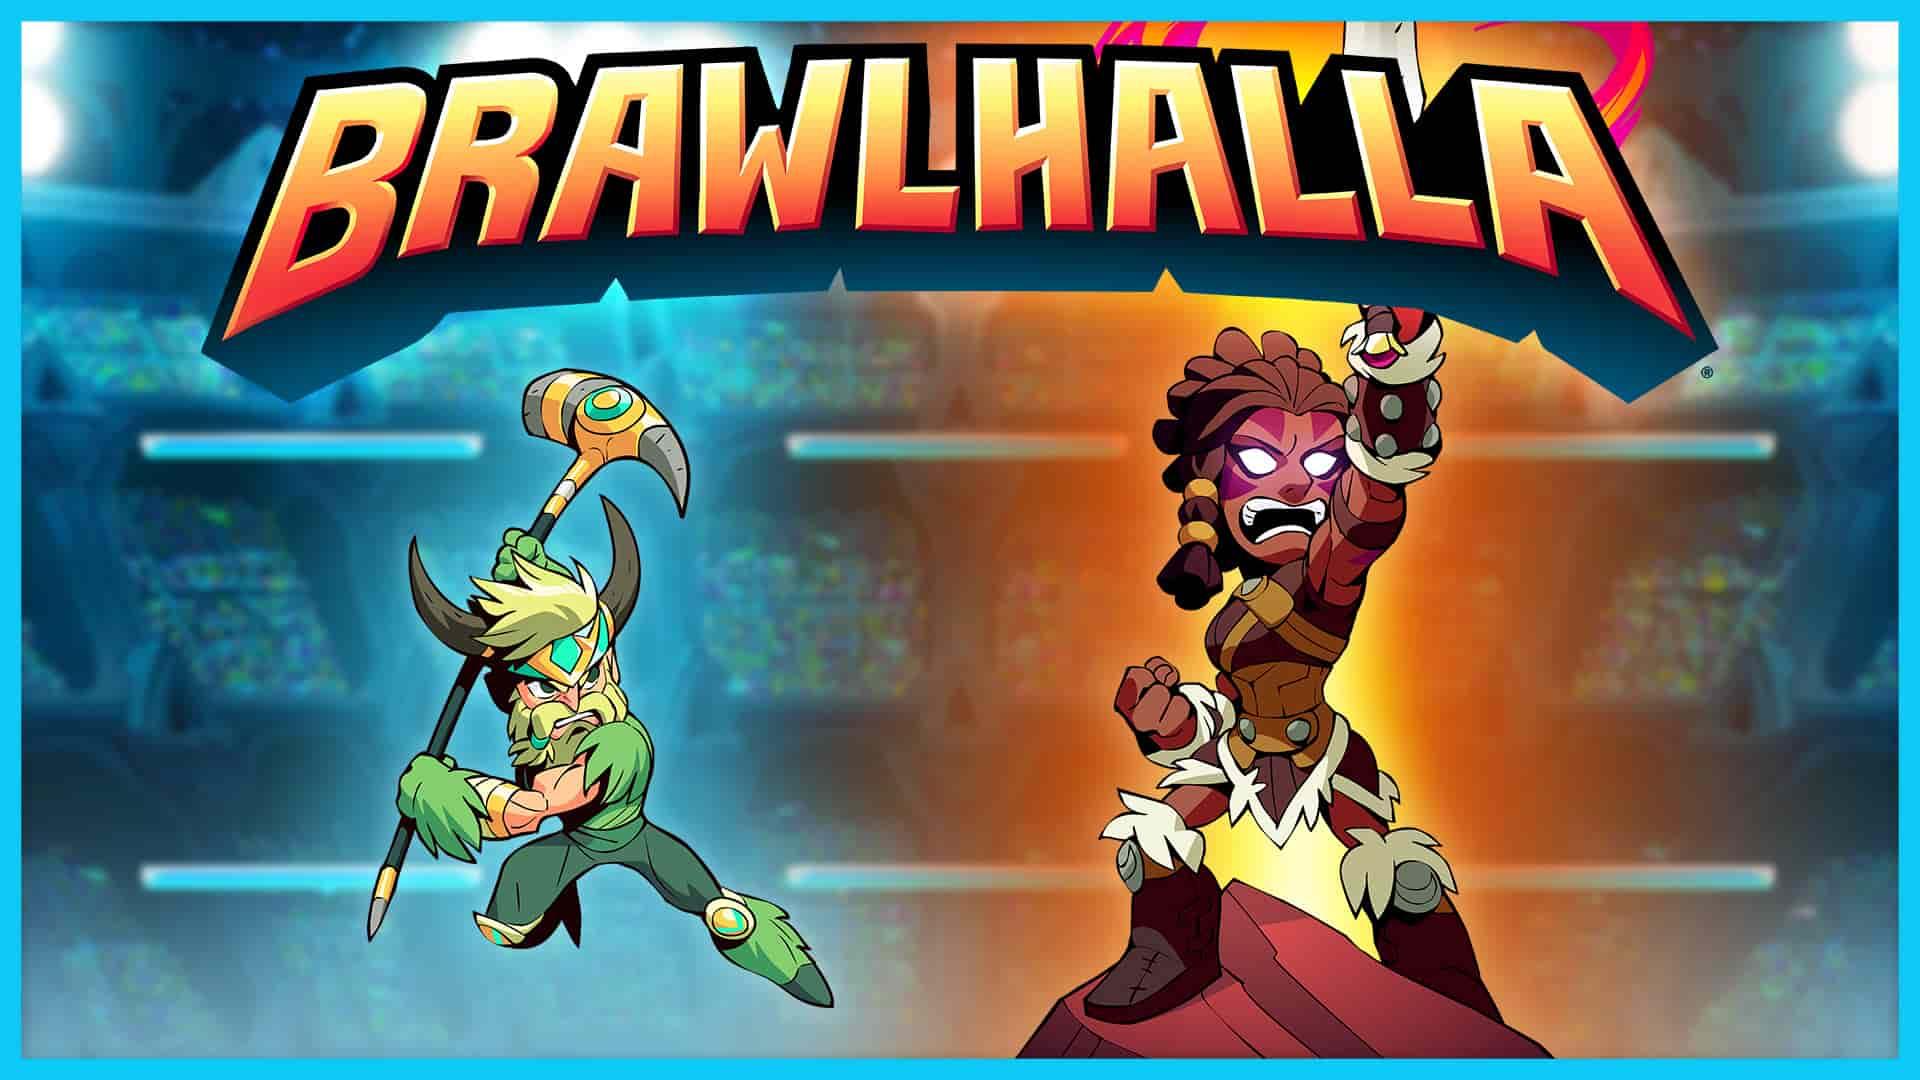 brawlhalla-ranked-system-season-21-2021